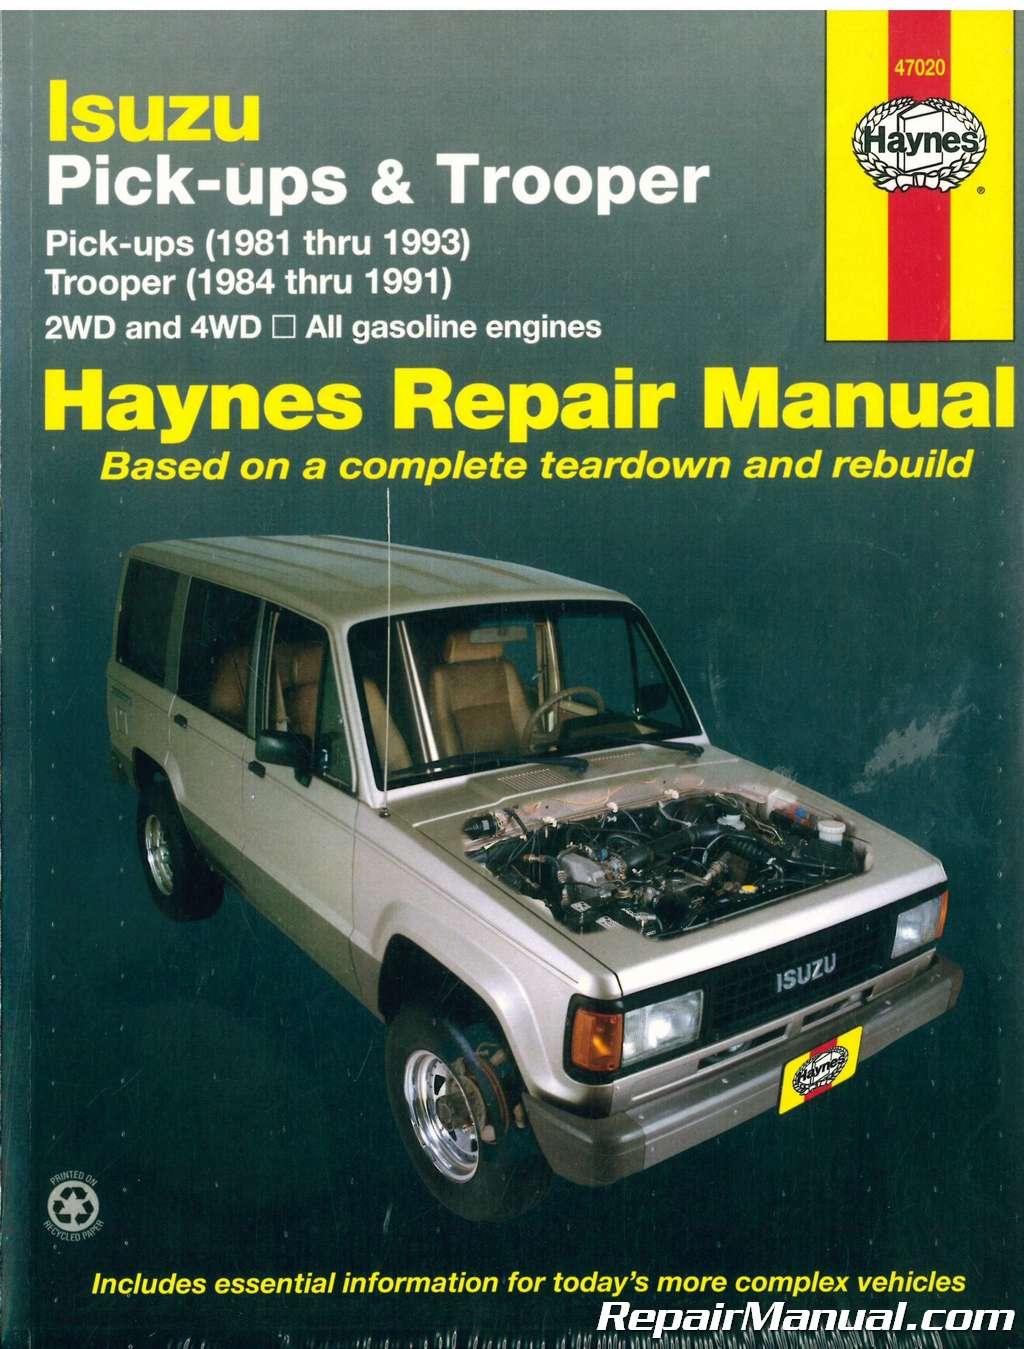 haynes isuzu trooper pick ups 1981 1993 auto repair manual rh repairmanual com 1991 isuzu trooper owners manual pdf 1995 Isuzu Trooper